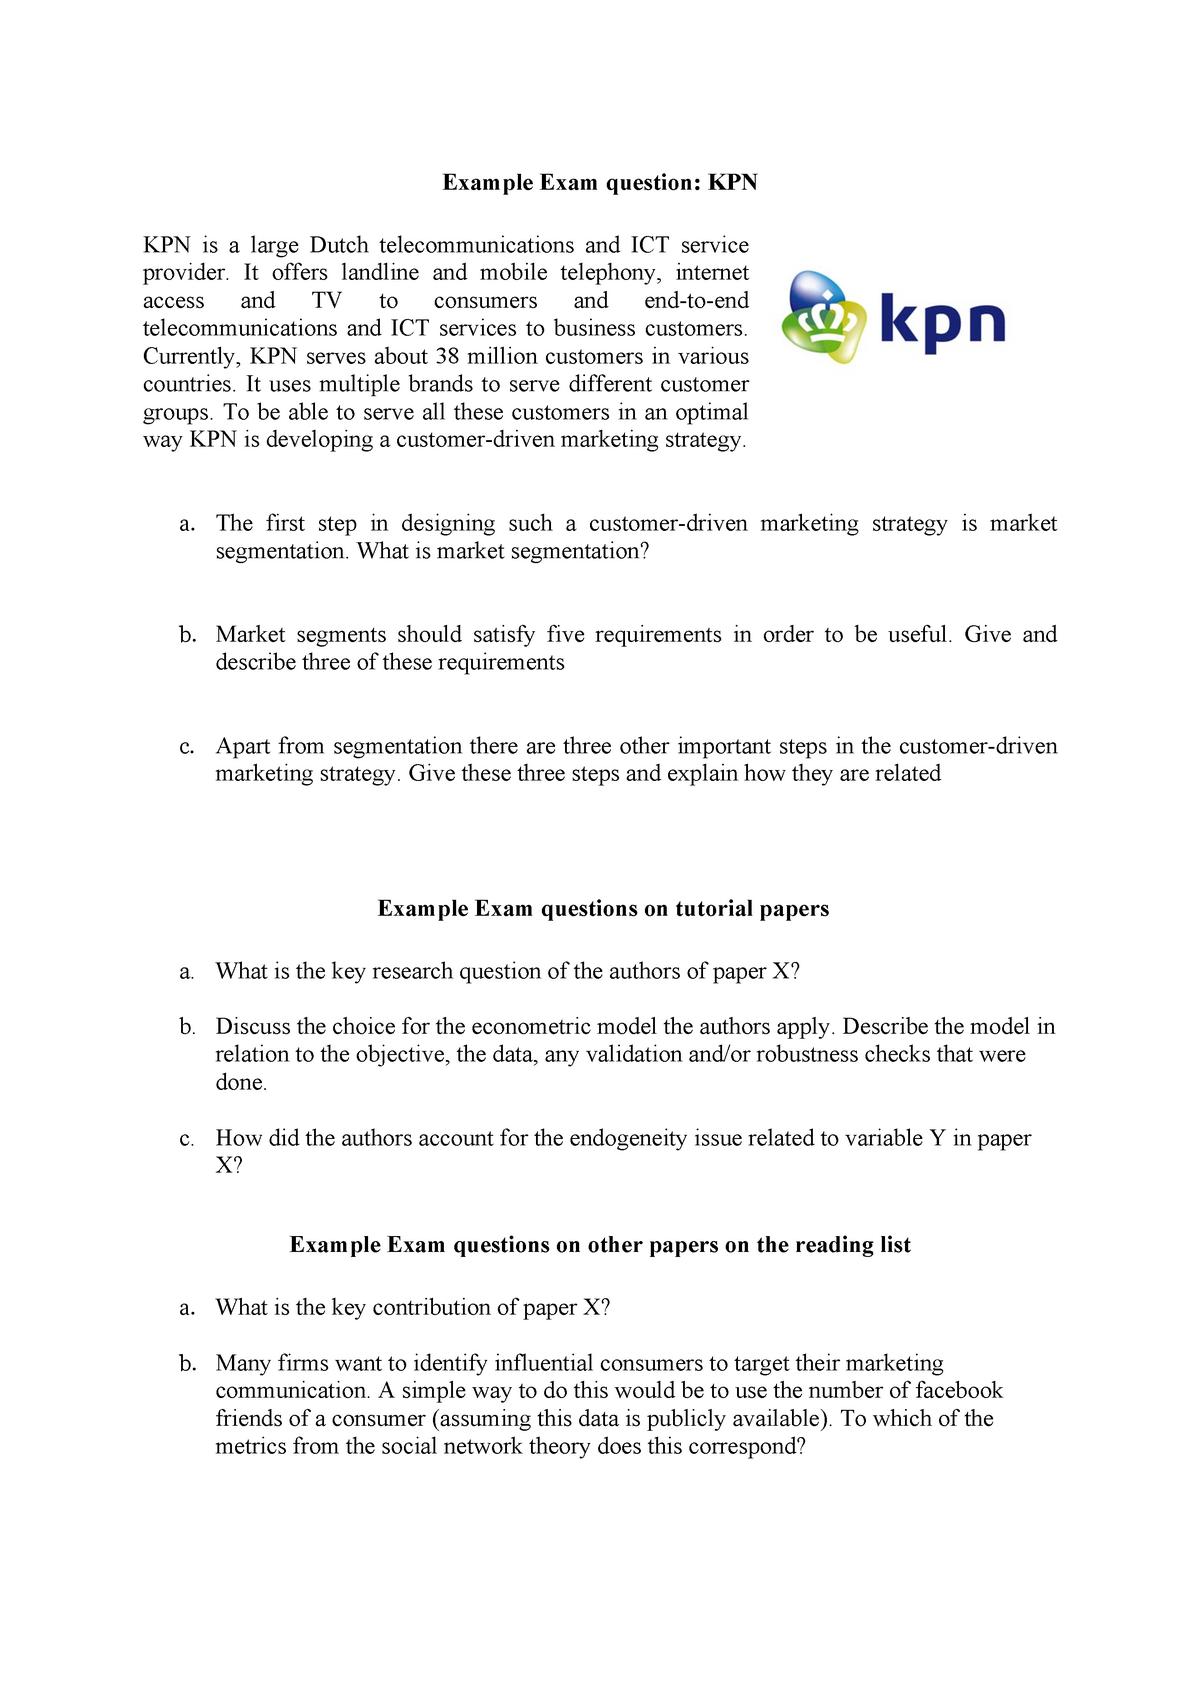 Dummy questions Marketing Analytics - EBB114A05: Marketing Analytics